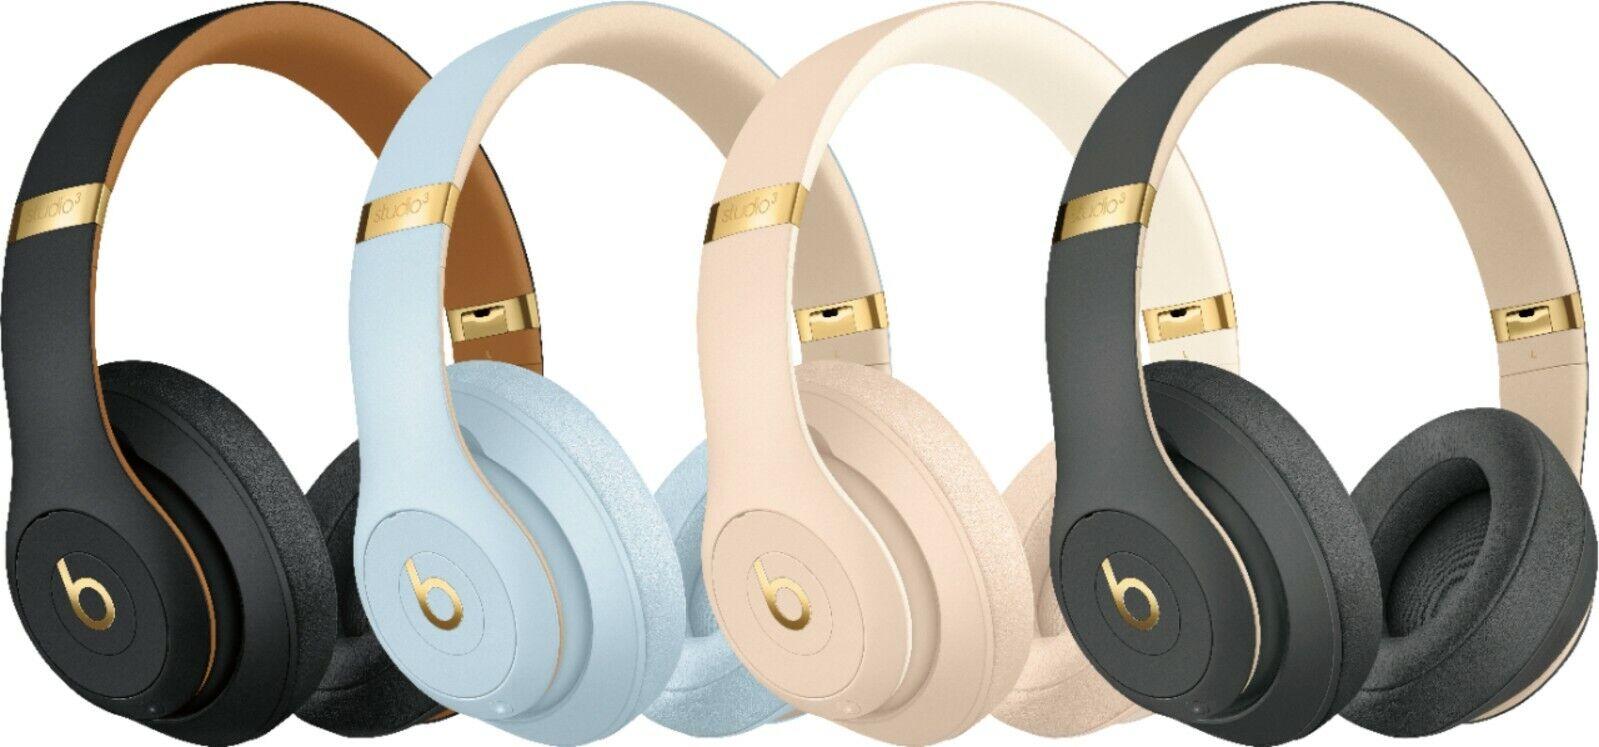 Bose SoundSport Wireless Bluetooth Earbuds Headphones InEar